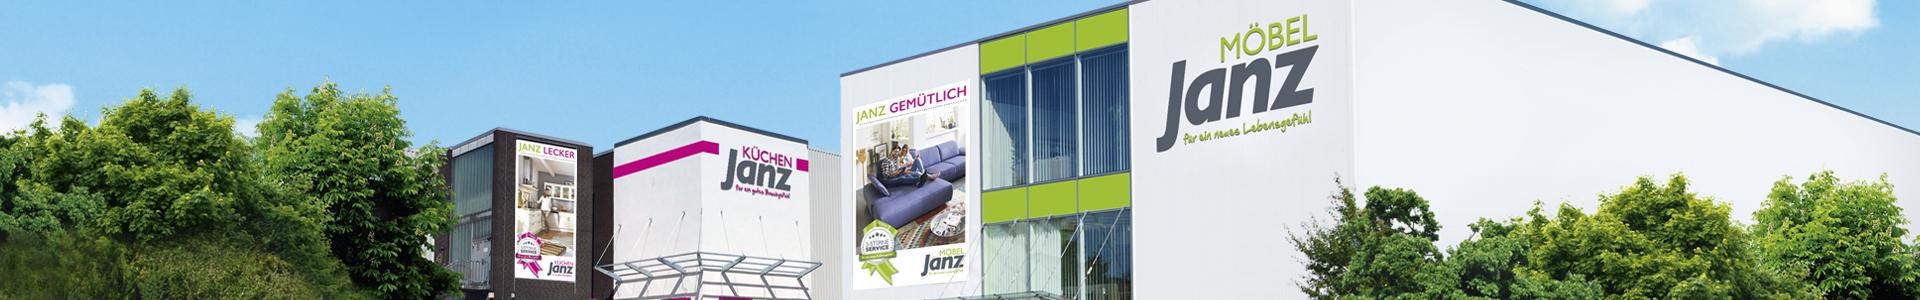 service inspektor k chen janz in sch nkirchen bei kiel. Black Bedroom Furniture Sets. Home Design Ideas